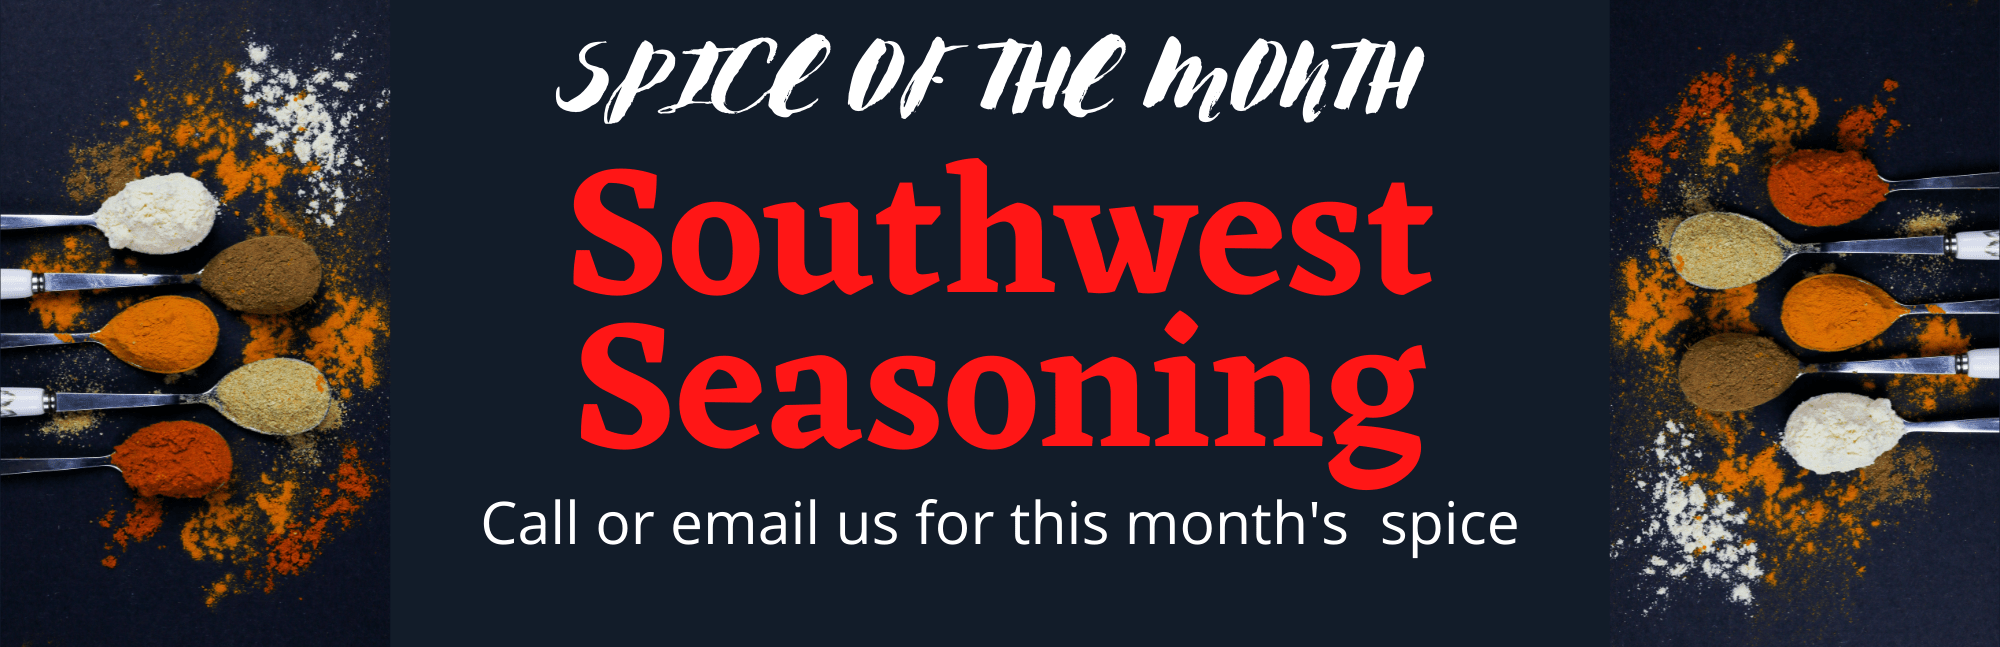 Southwest Seasoning Kit